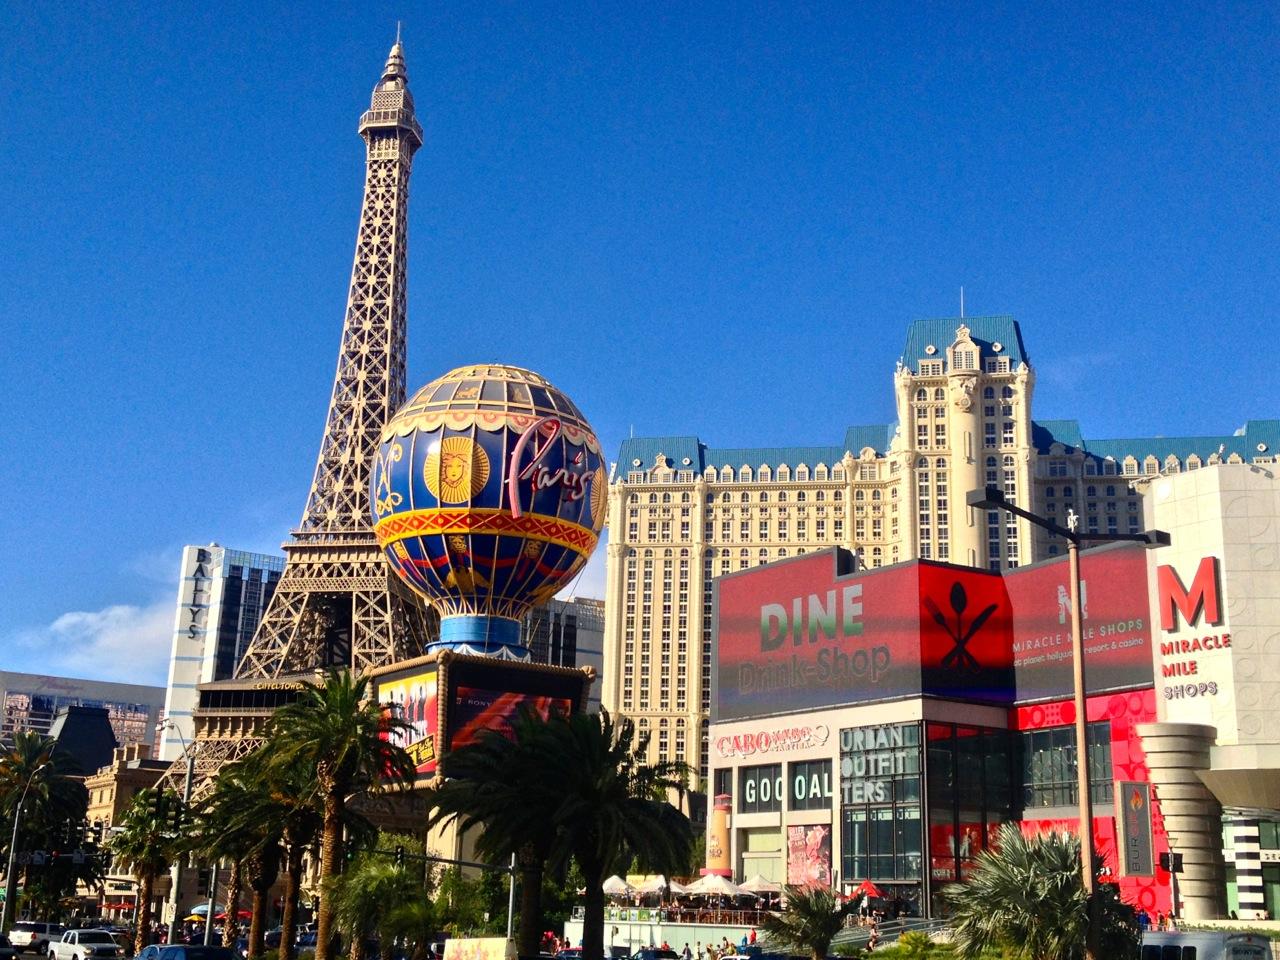 Picture Postcard Vegas